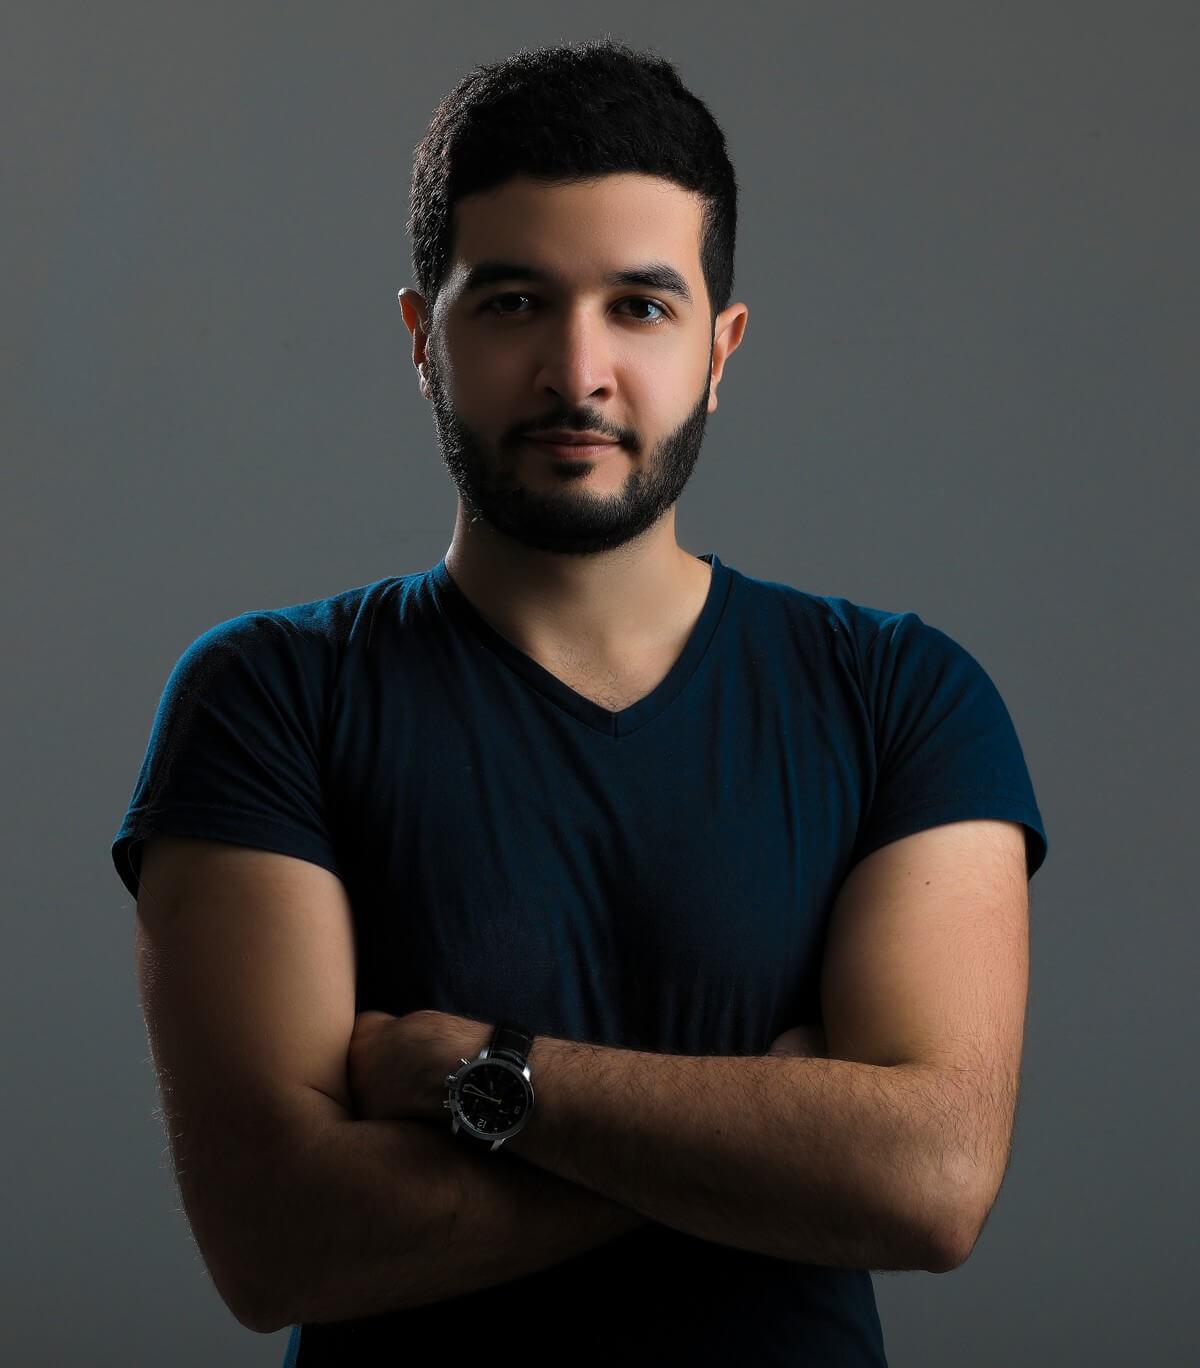 Ahmed Lahlou